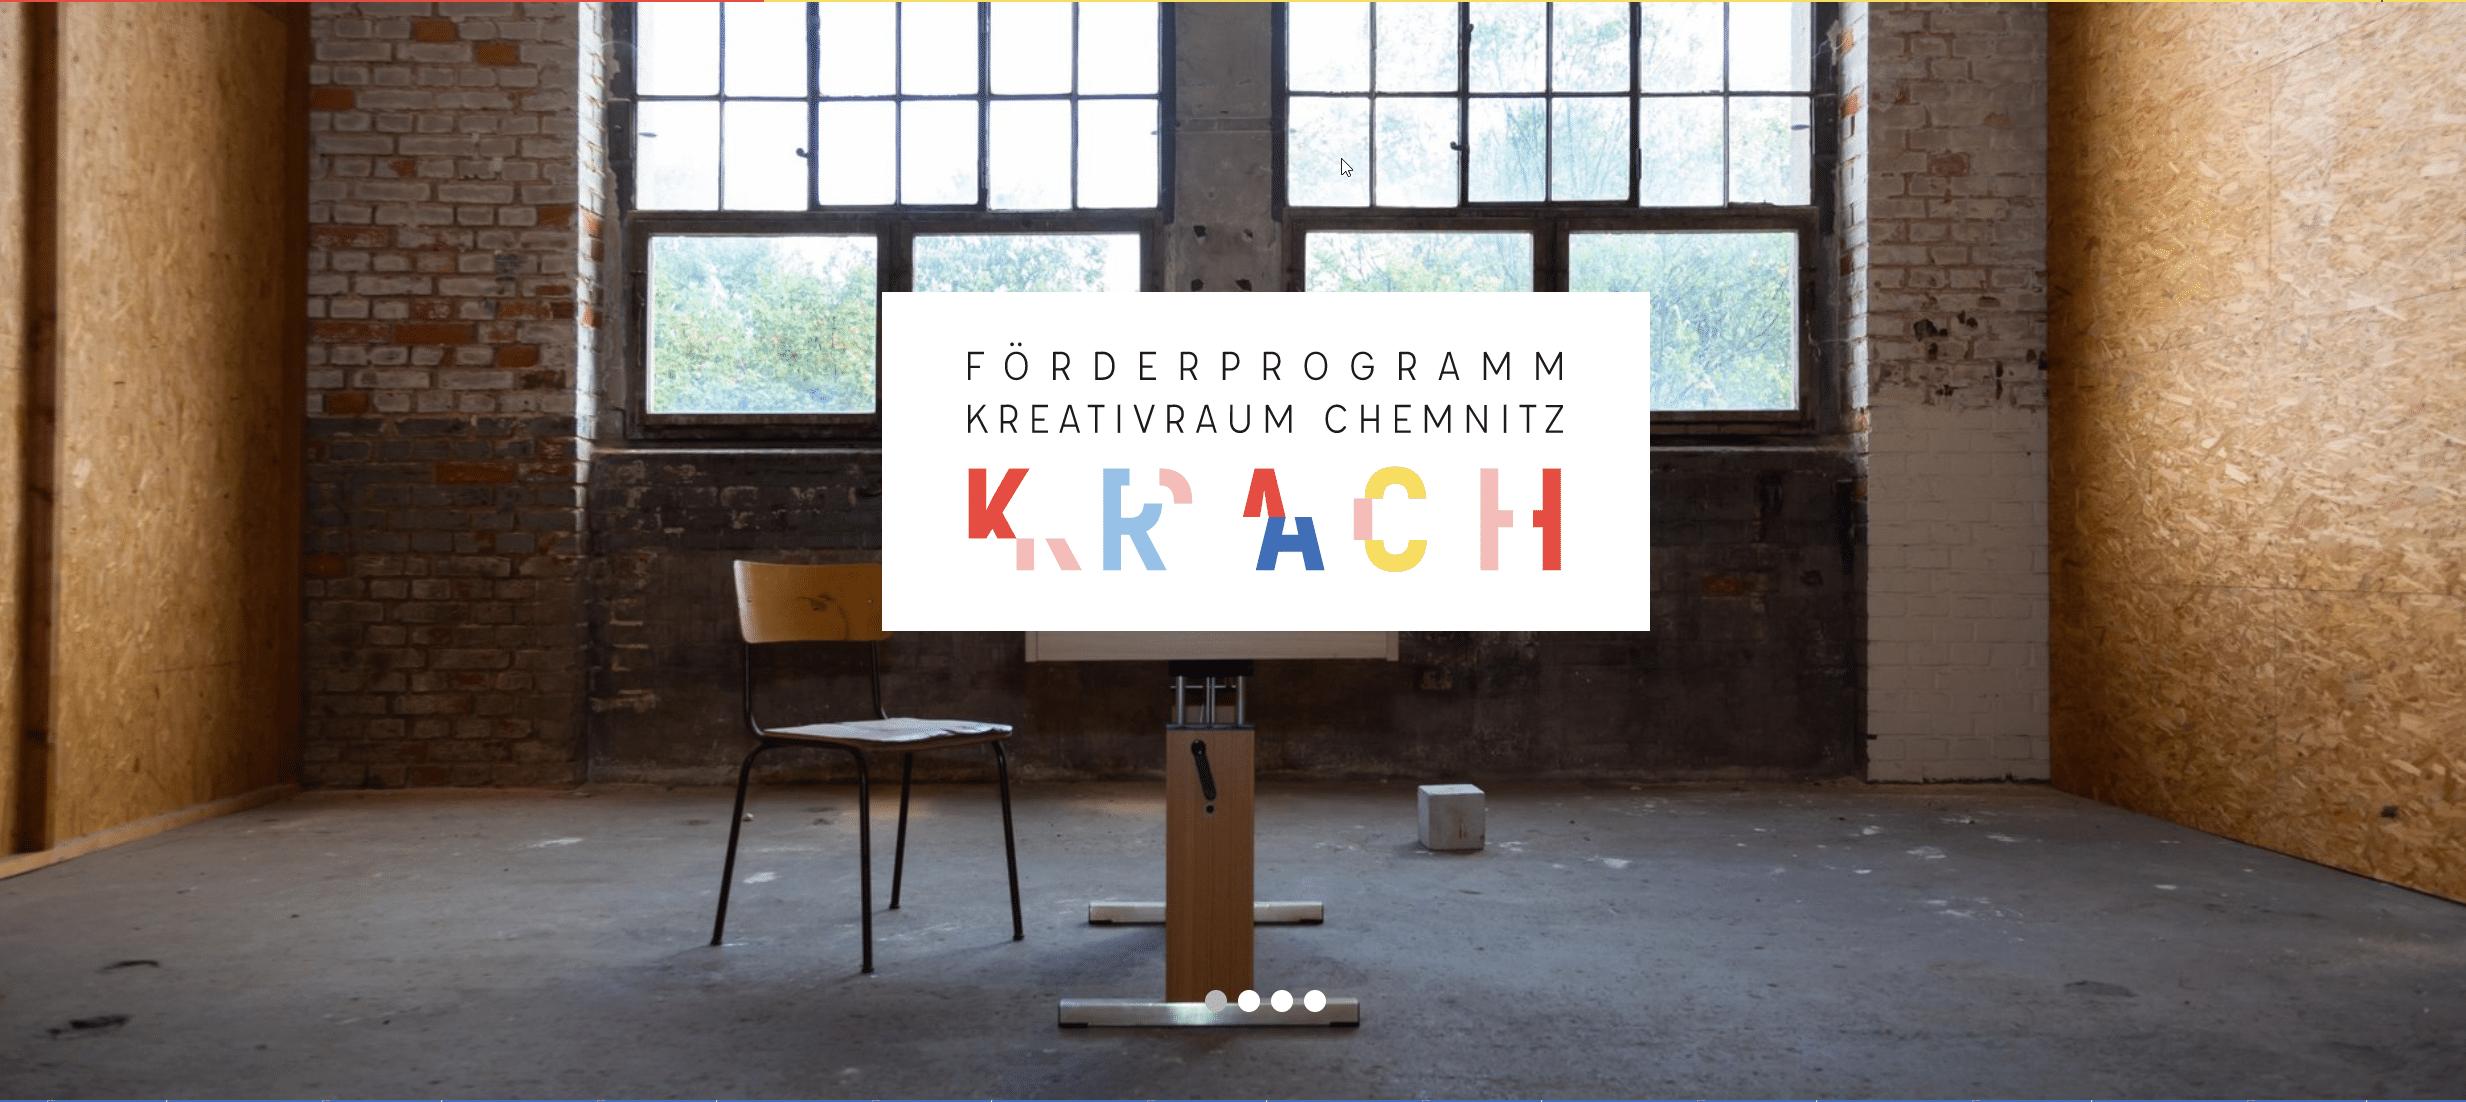 2021-01-12 13_09_50-KRACH-Kreativraum Chemnitz - Kreativraum Chemnitz